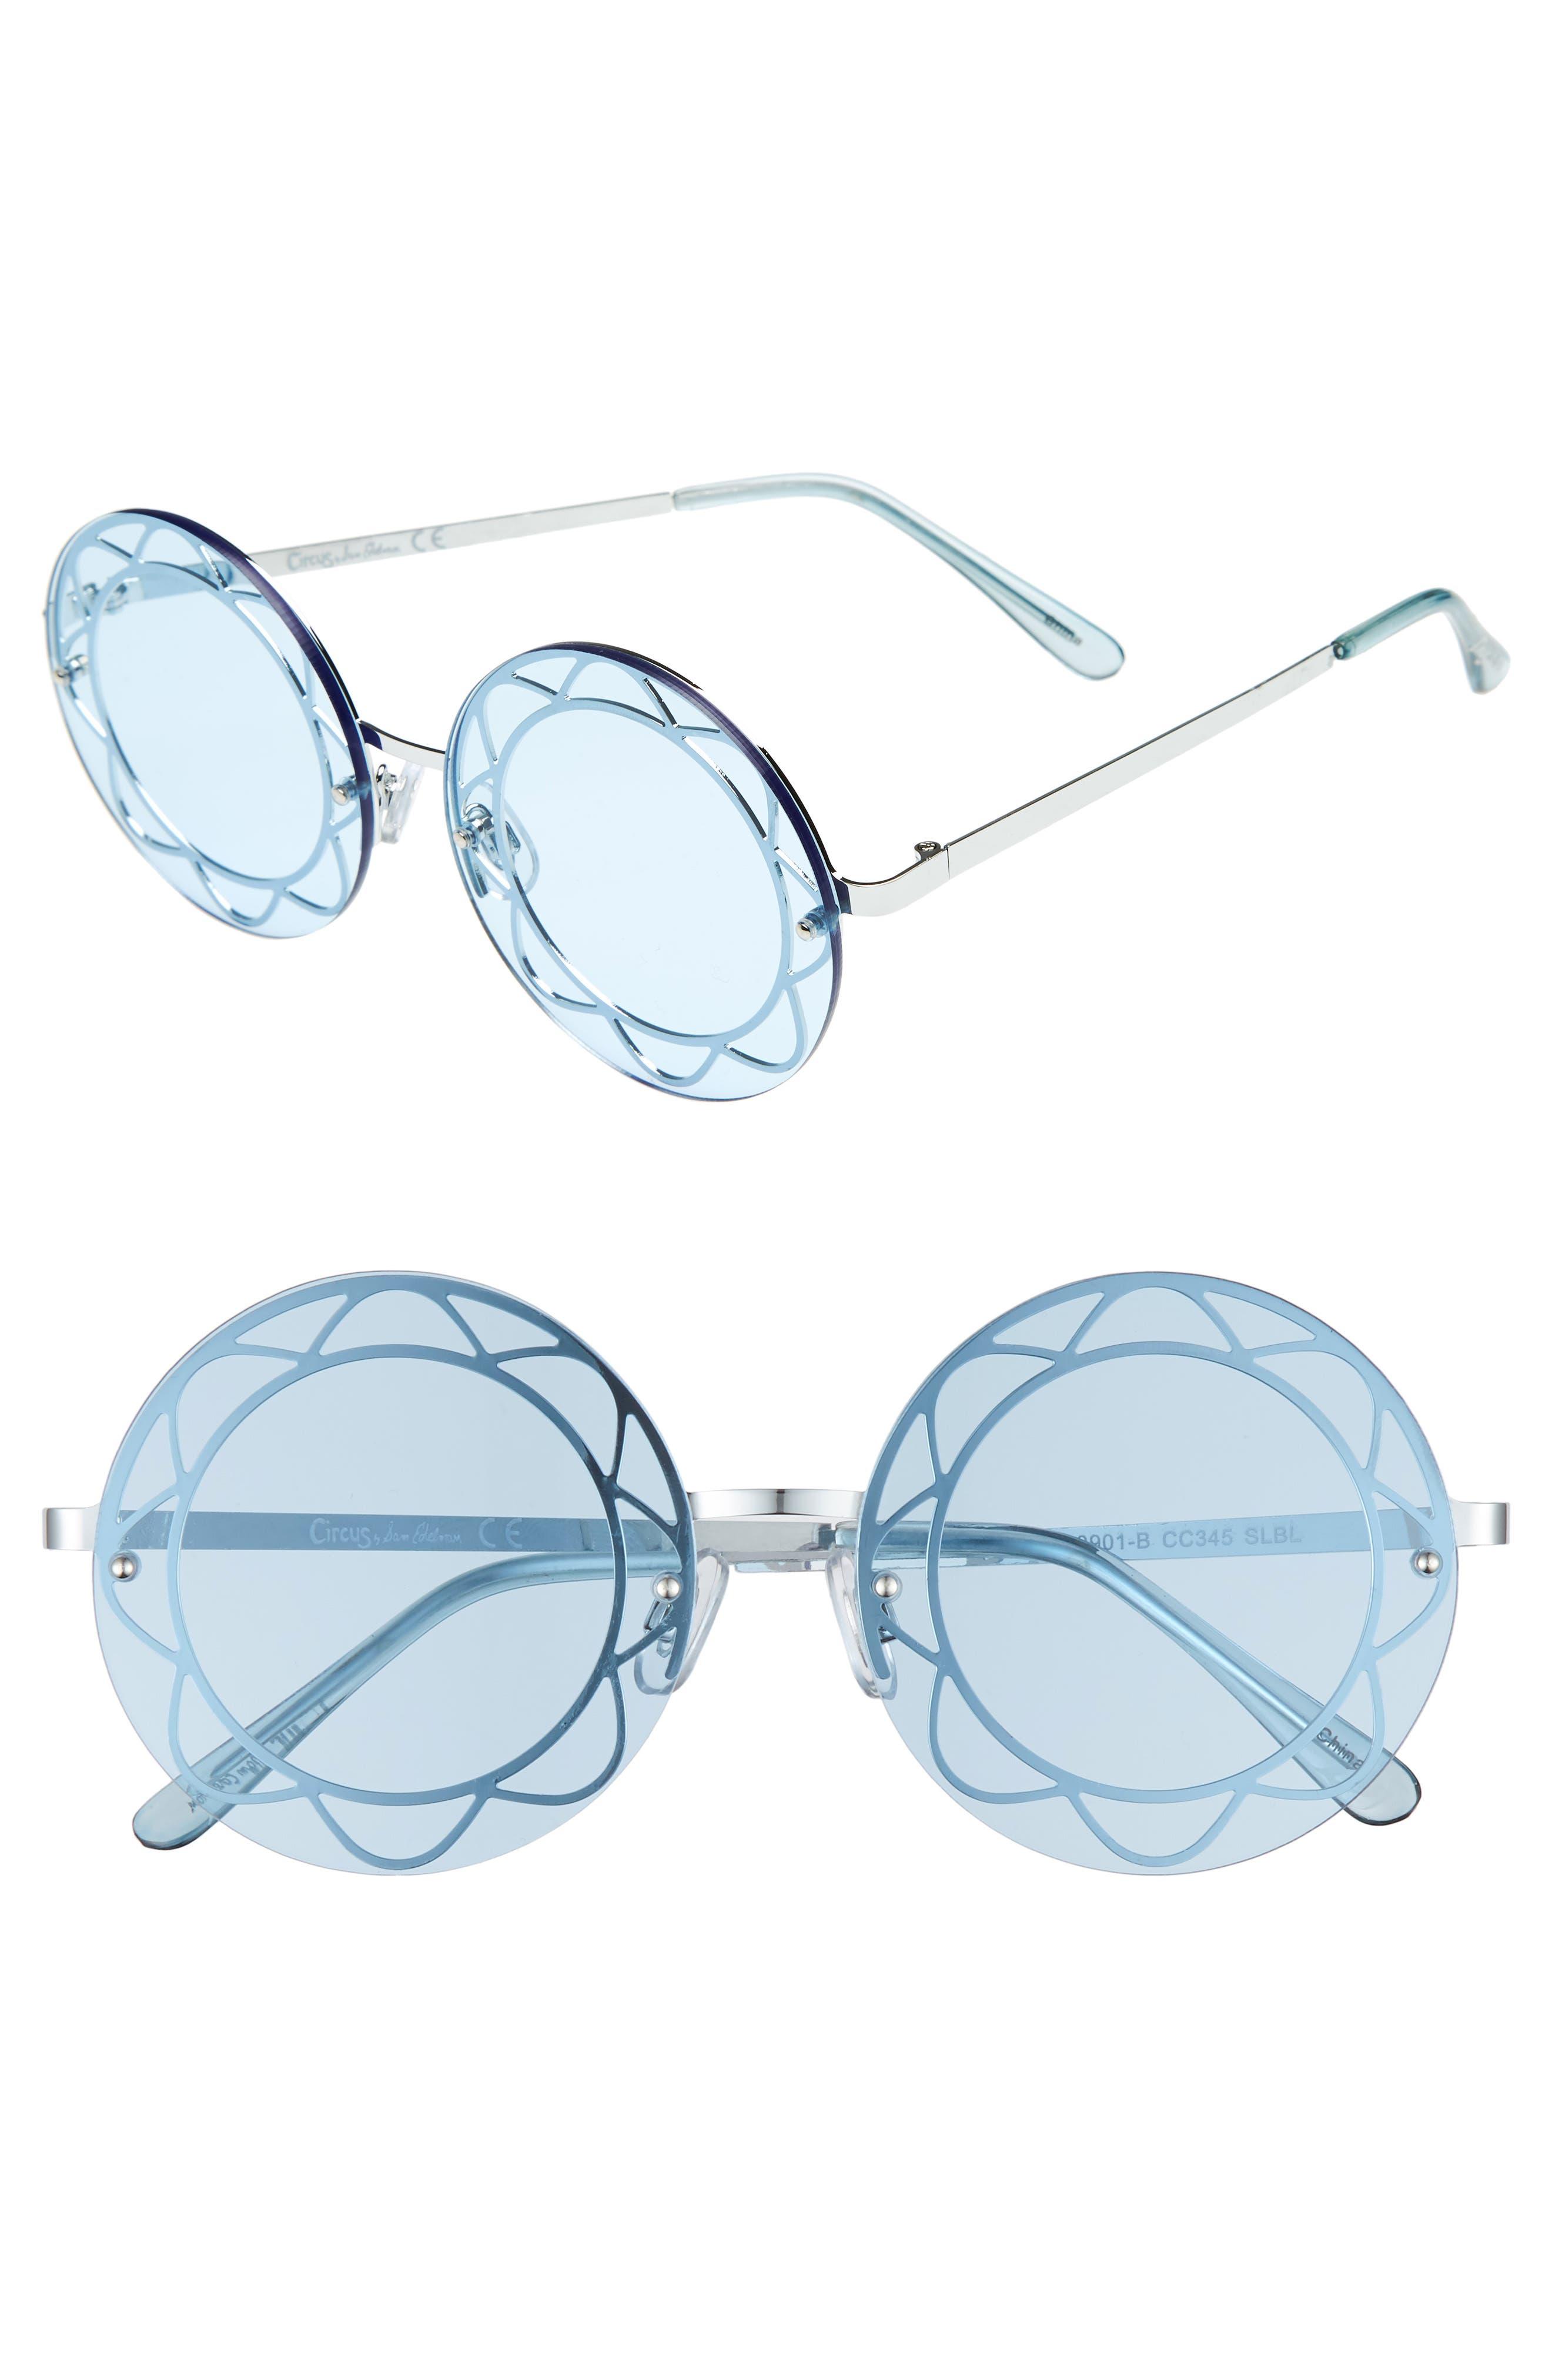 55mm Round Sunglasses,                             Main thumbnail 1, color,                             047